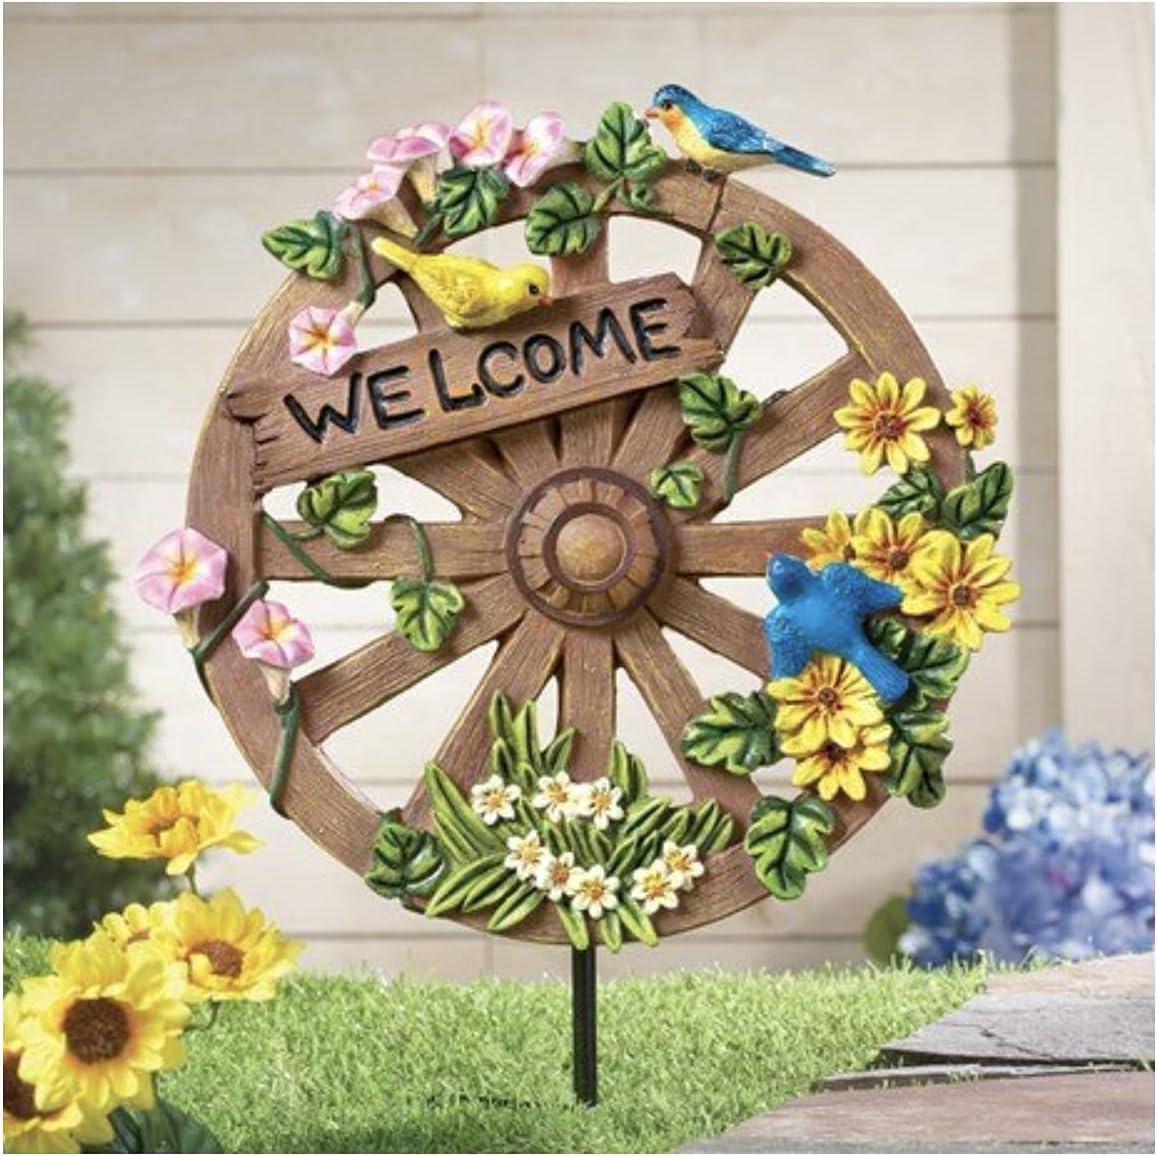 At Home Spring Floral Wagon Wheel Yard Decor